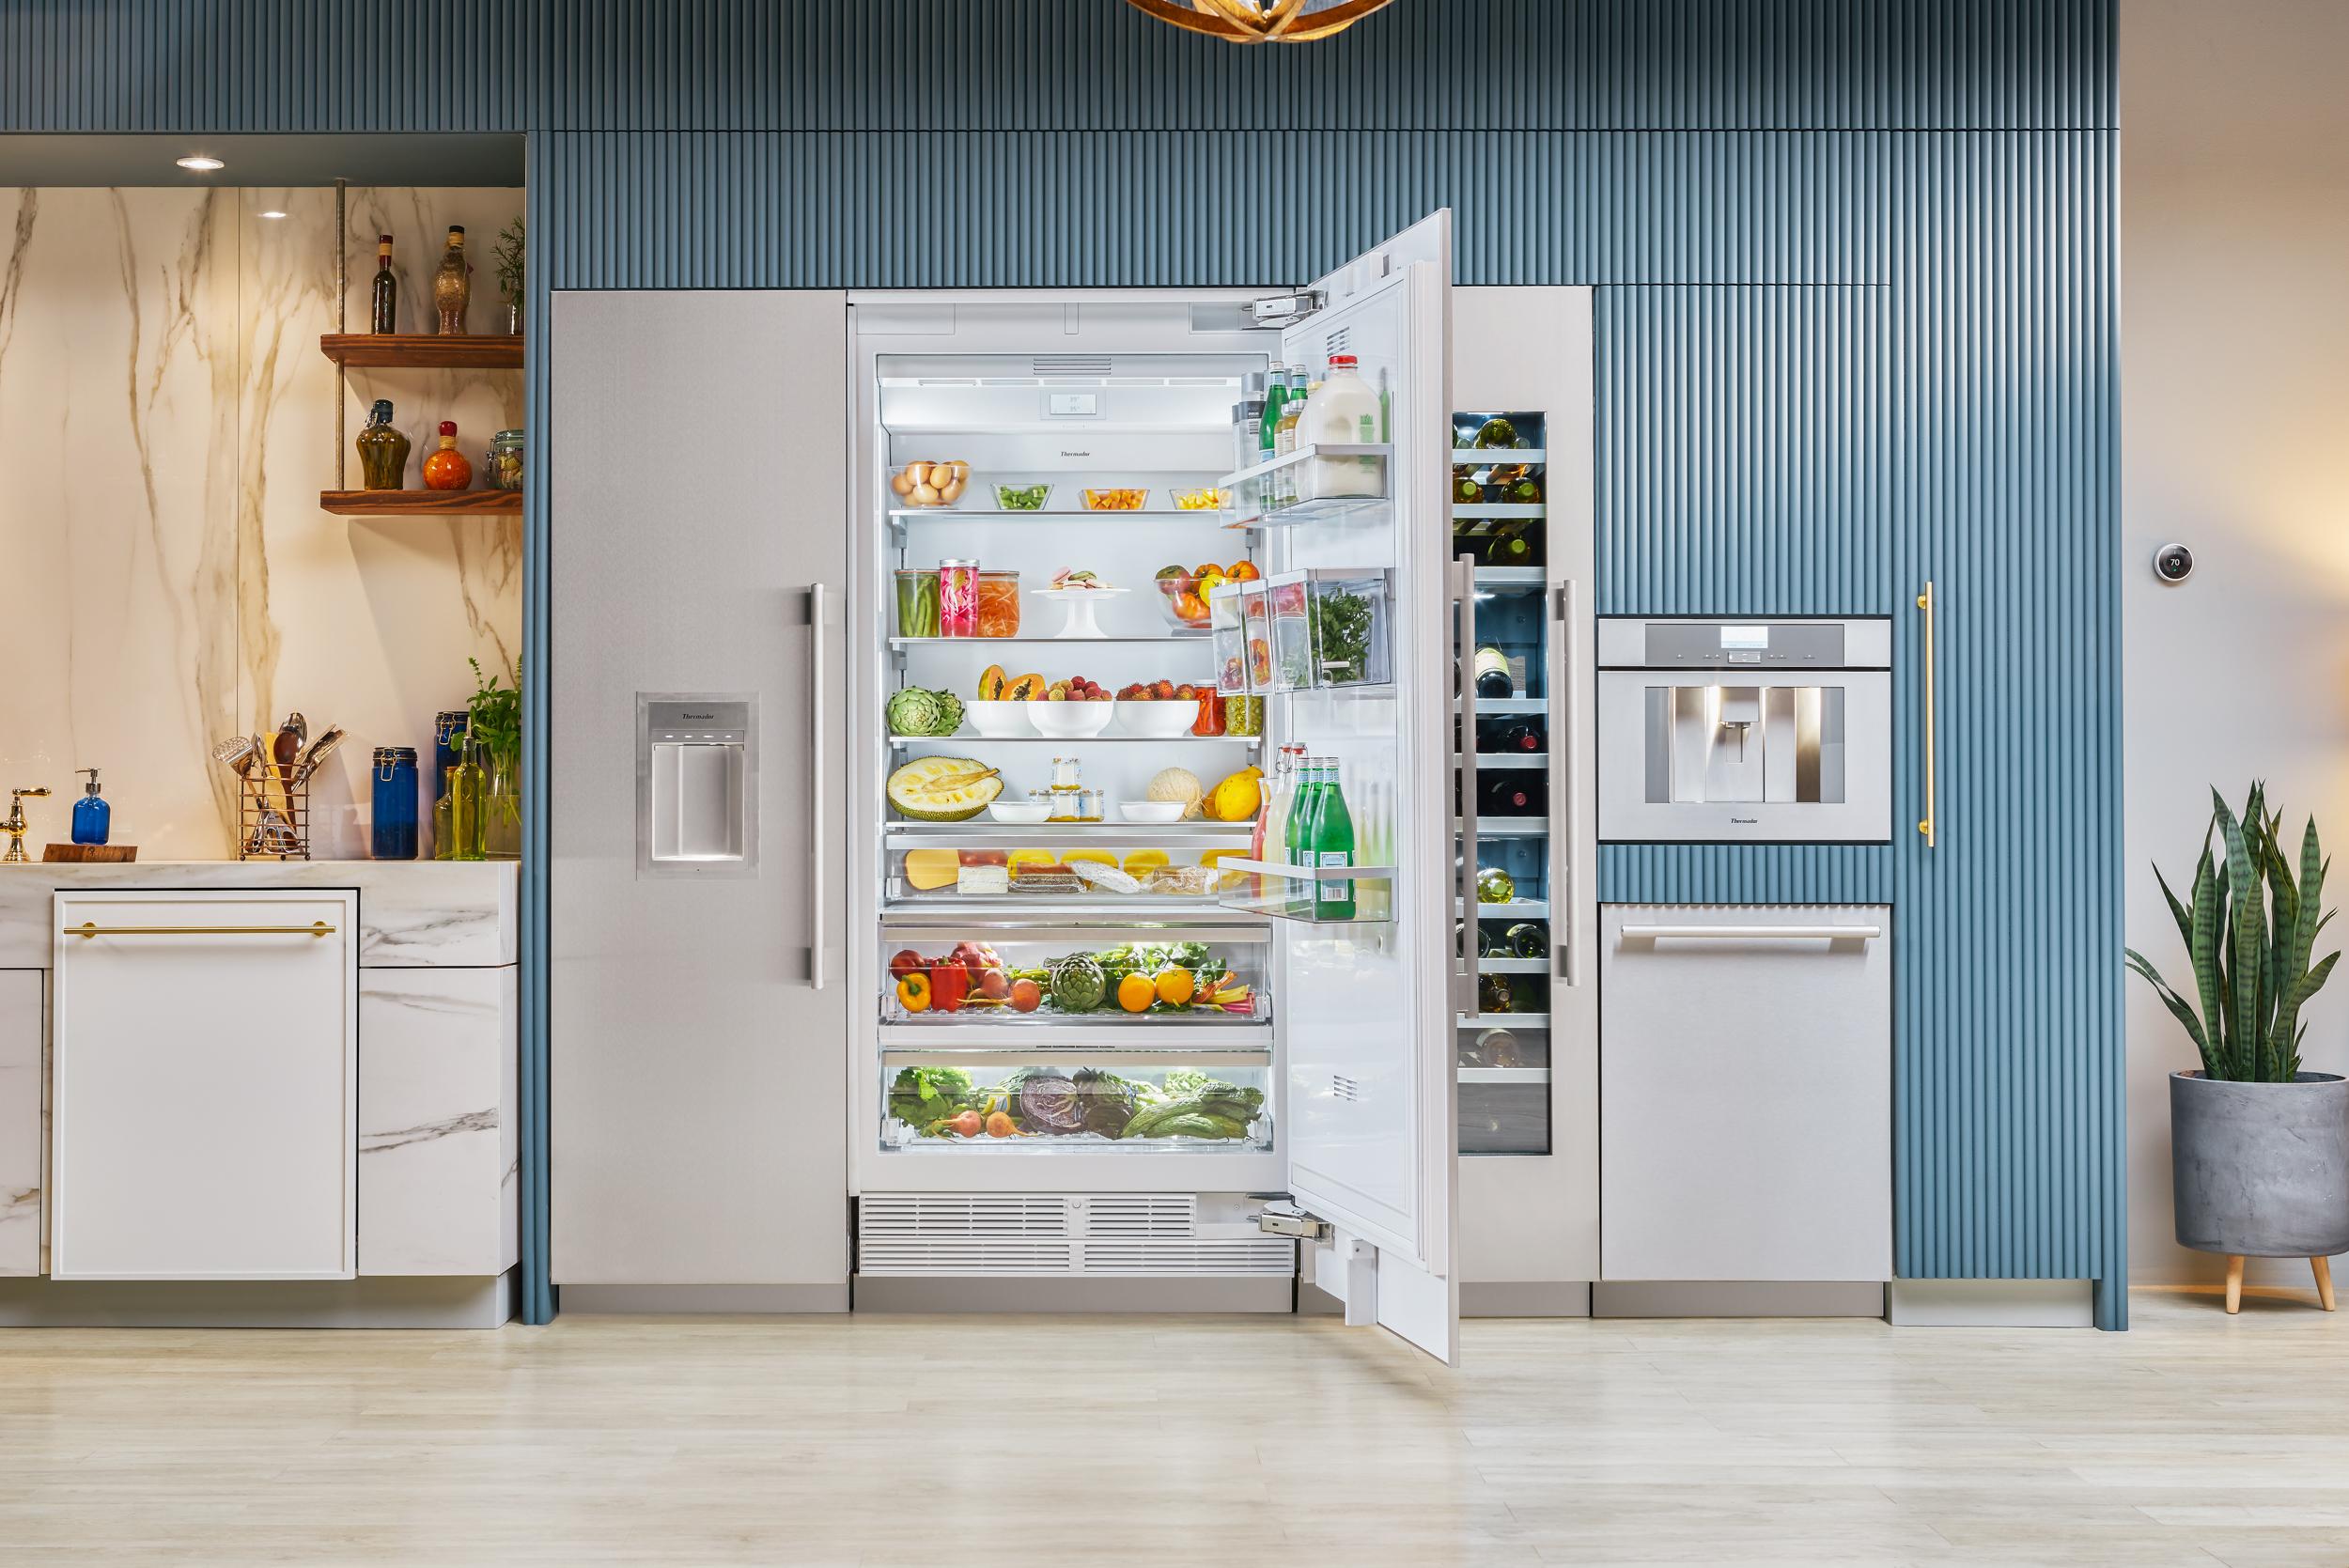 Thermador-36-inch-Master-Fridge-fridge-open-T36IR900SP.jpg